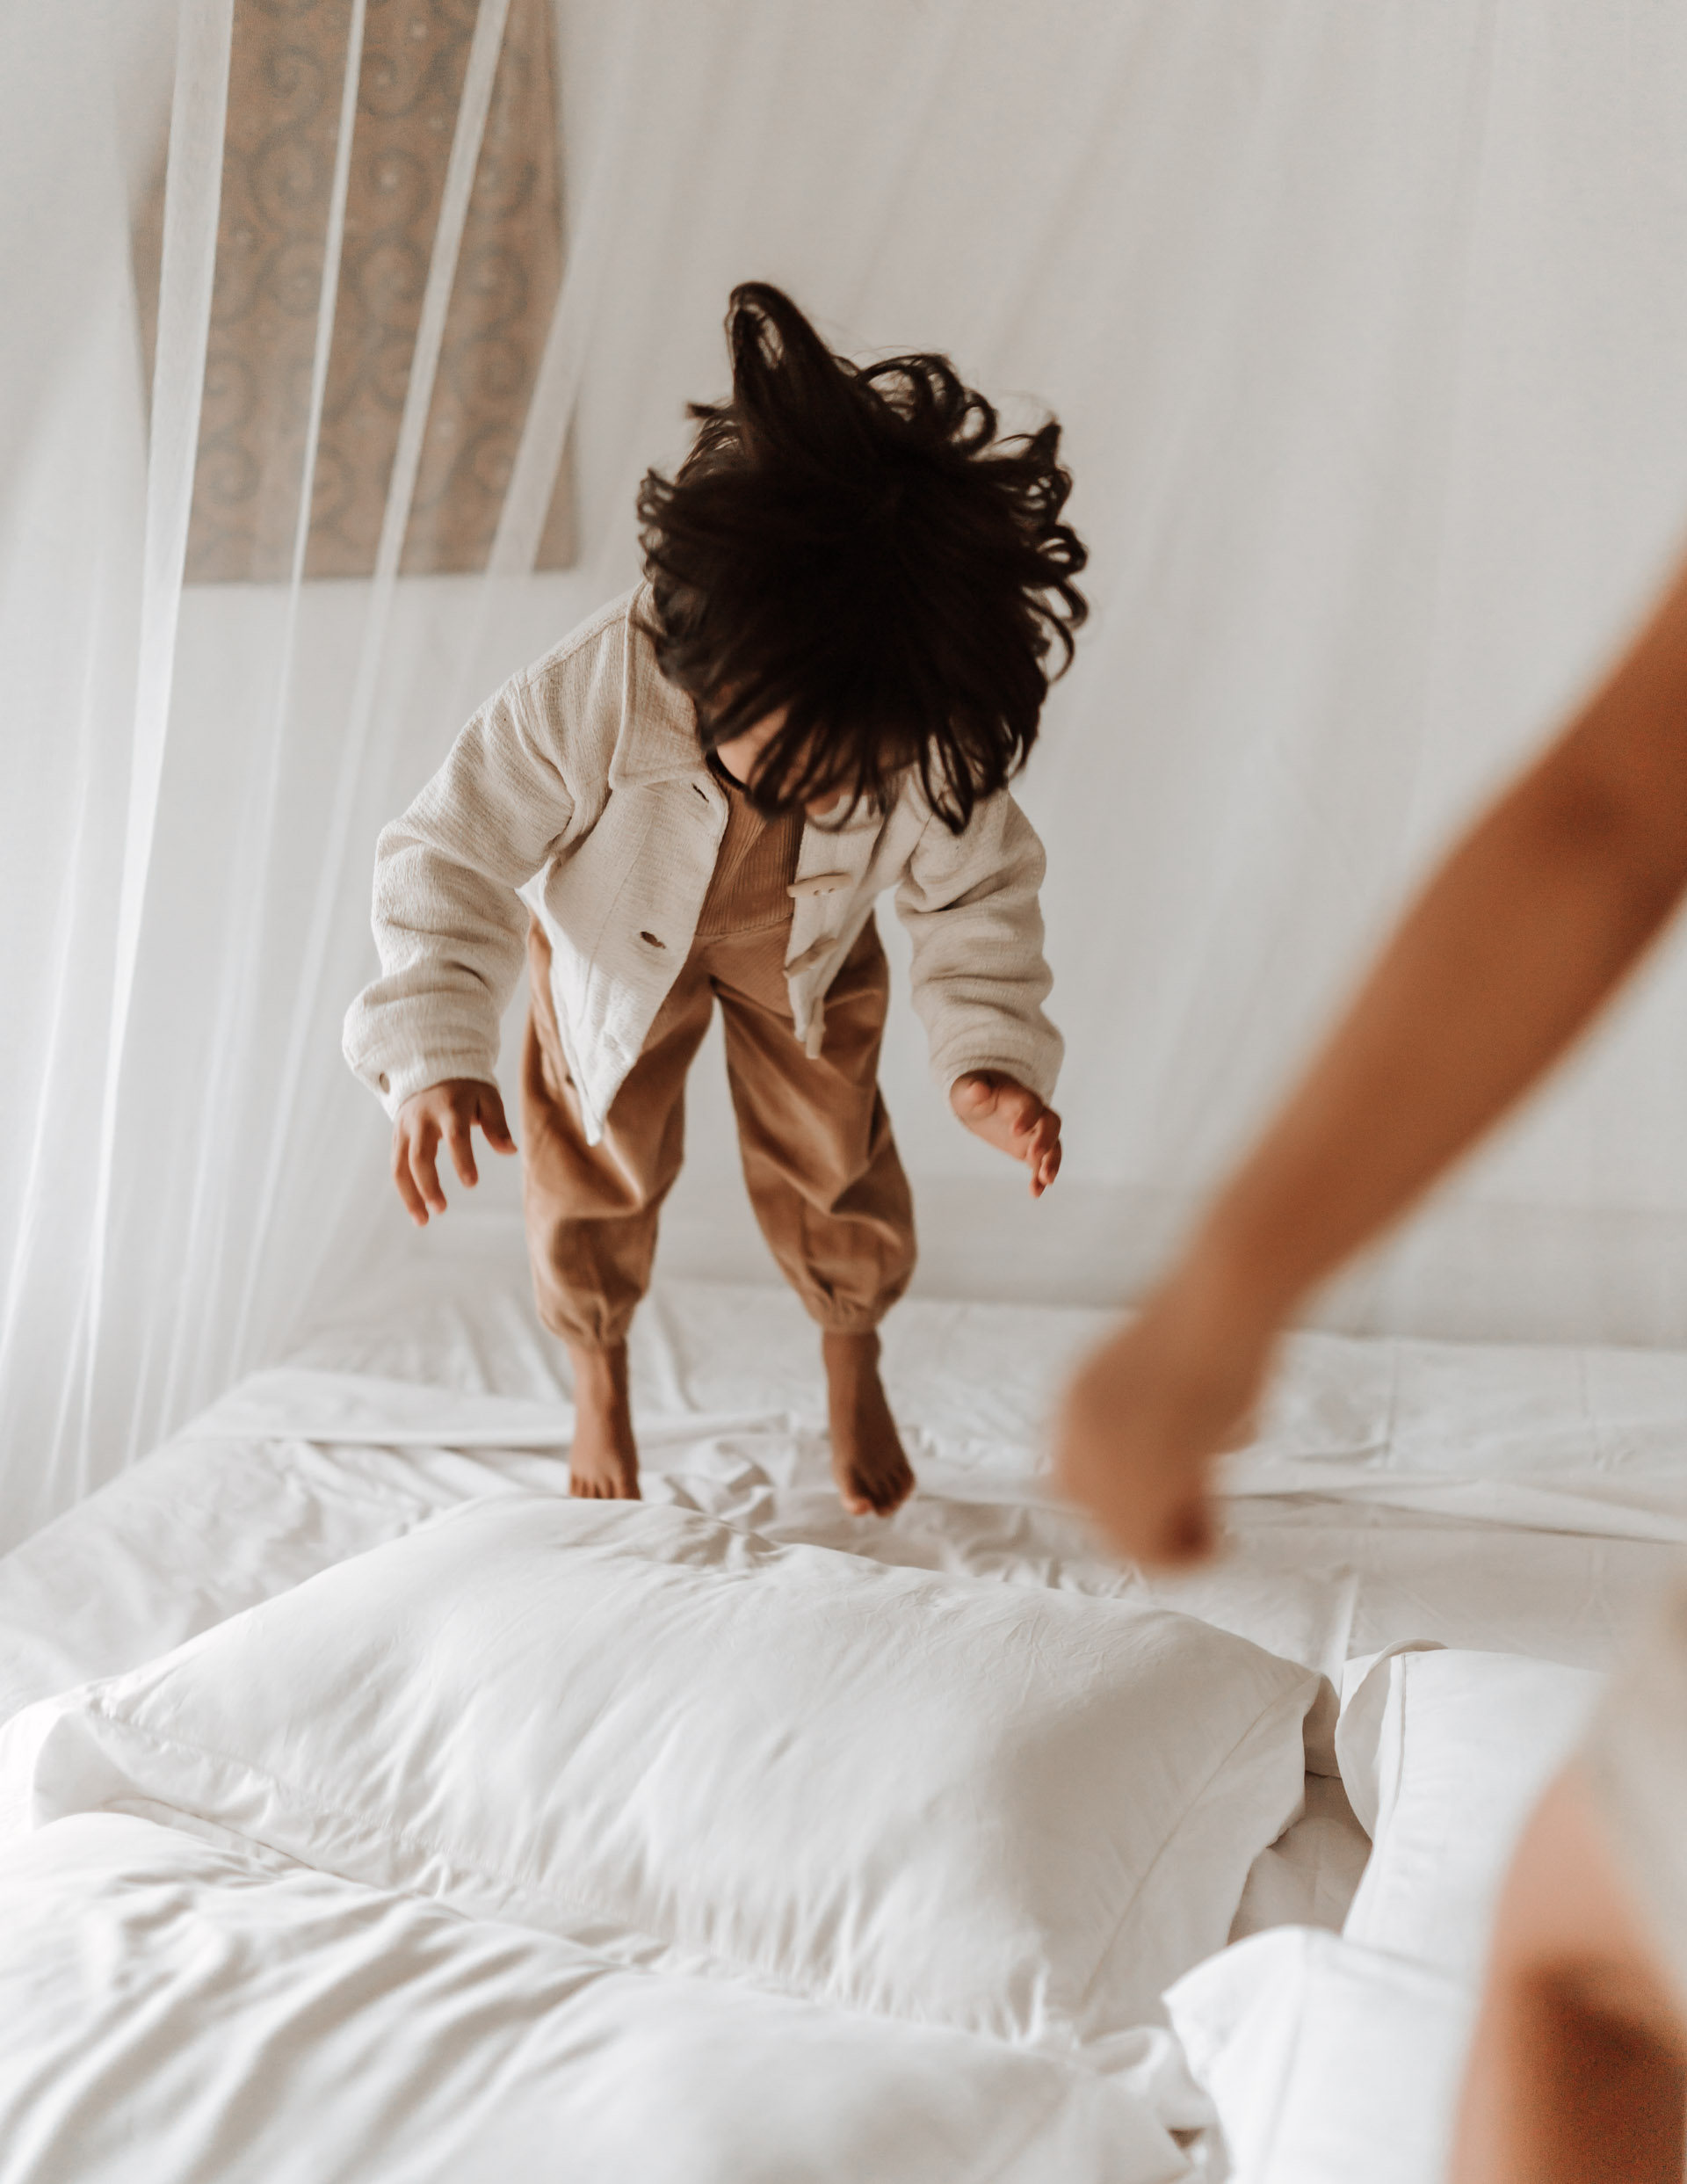 keira-mason-illoura-the-label-boy-jumping-on-bed.jpg